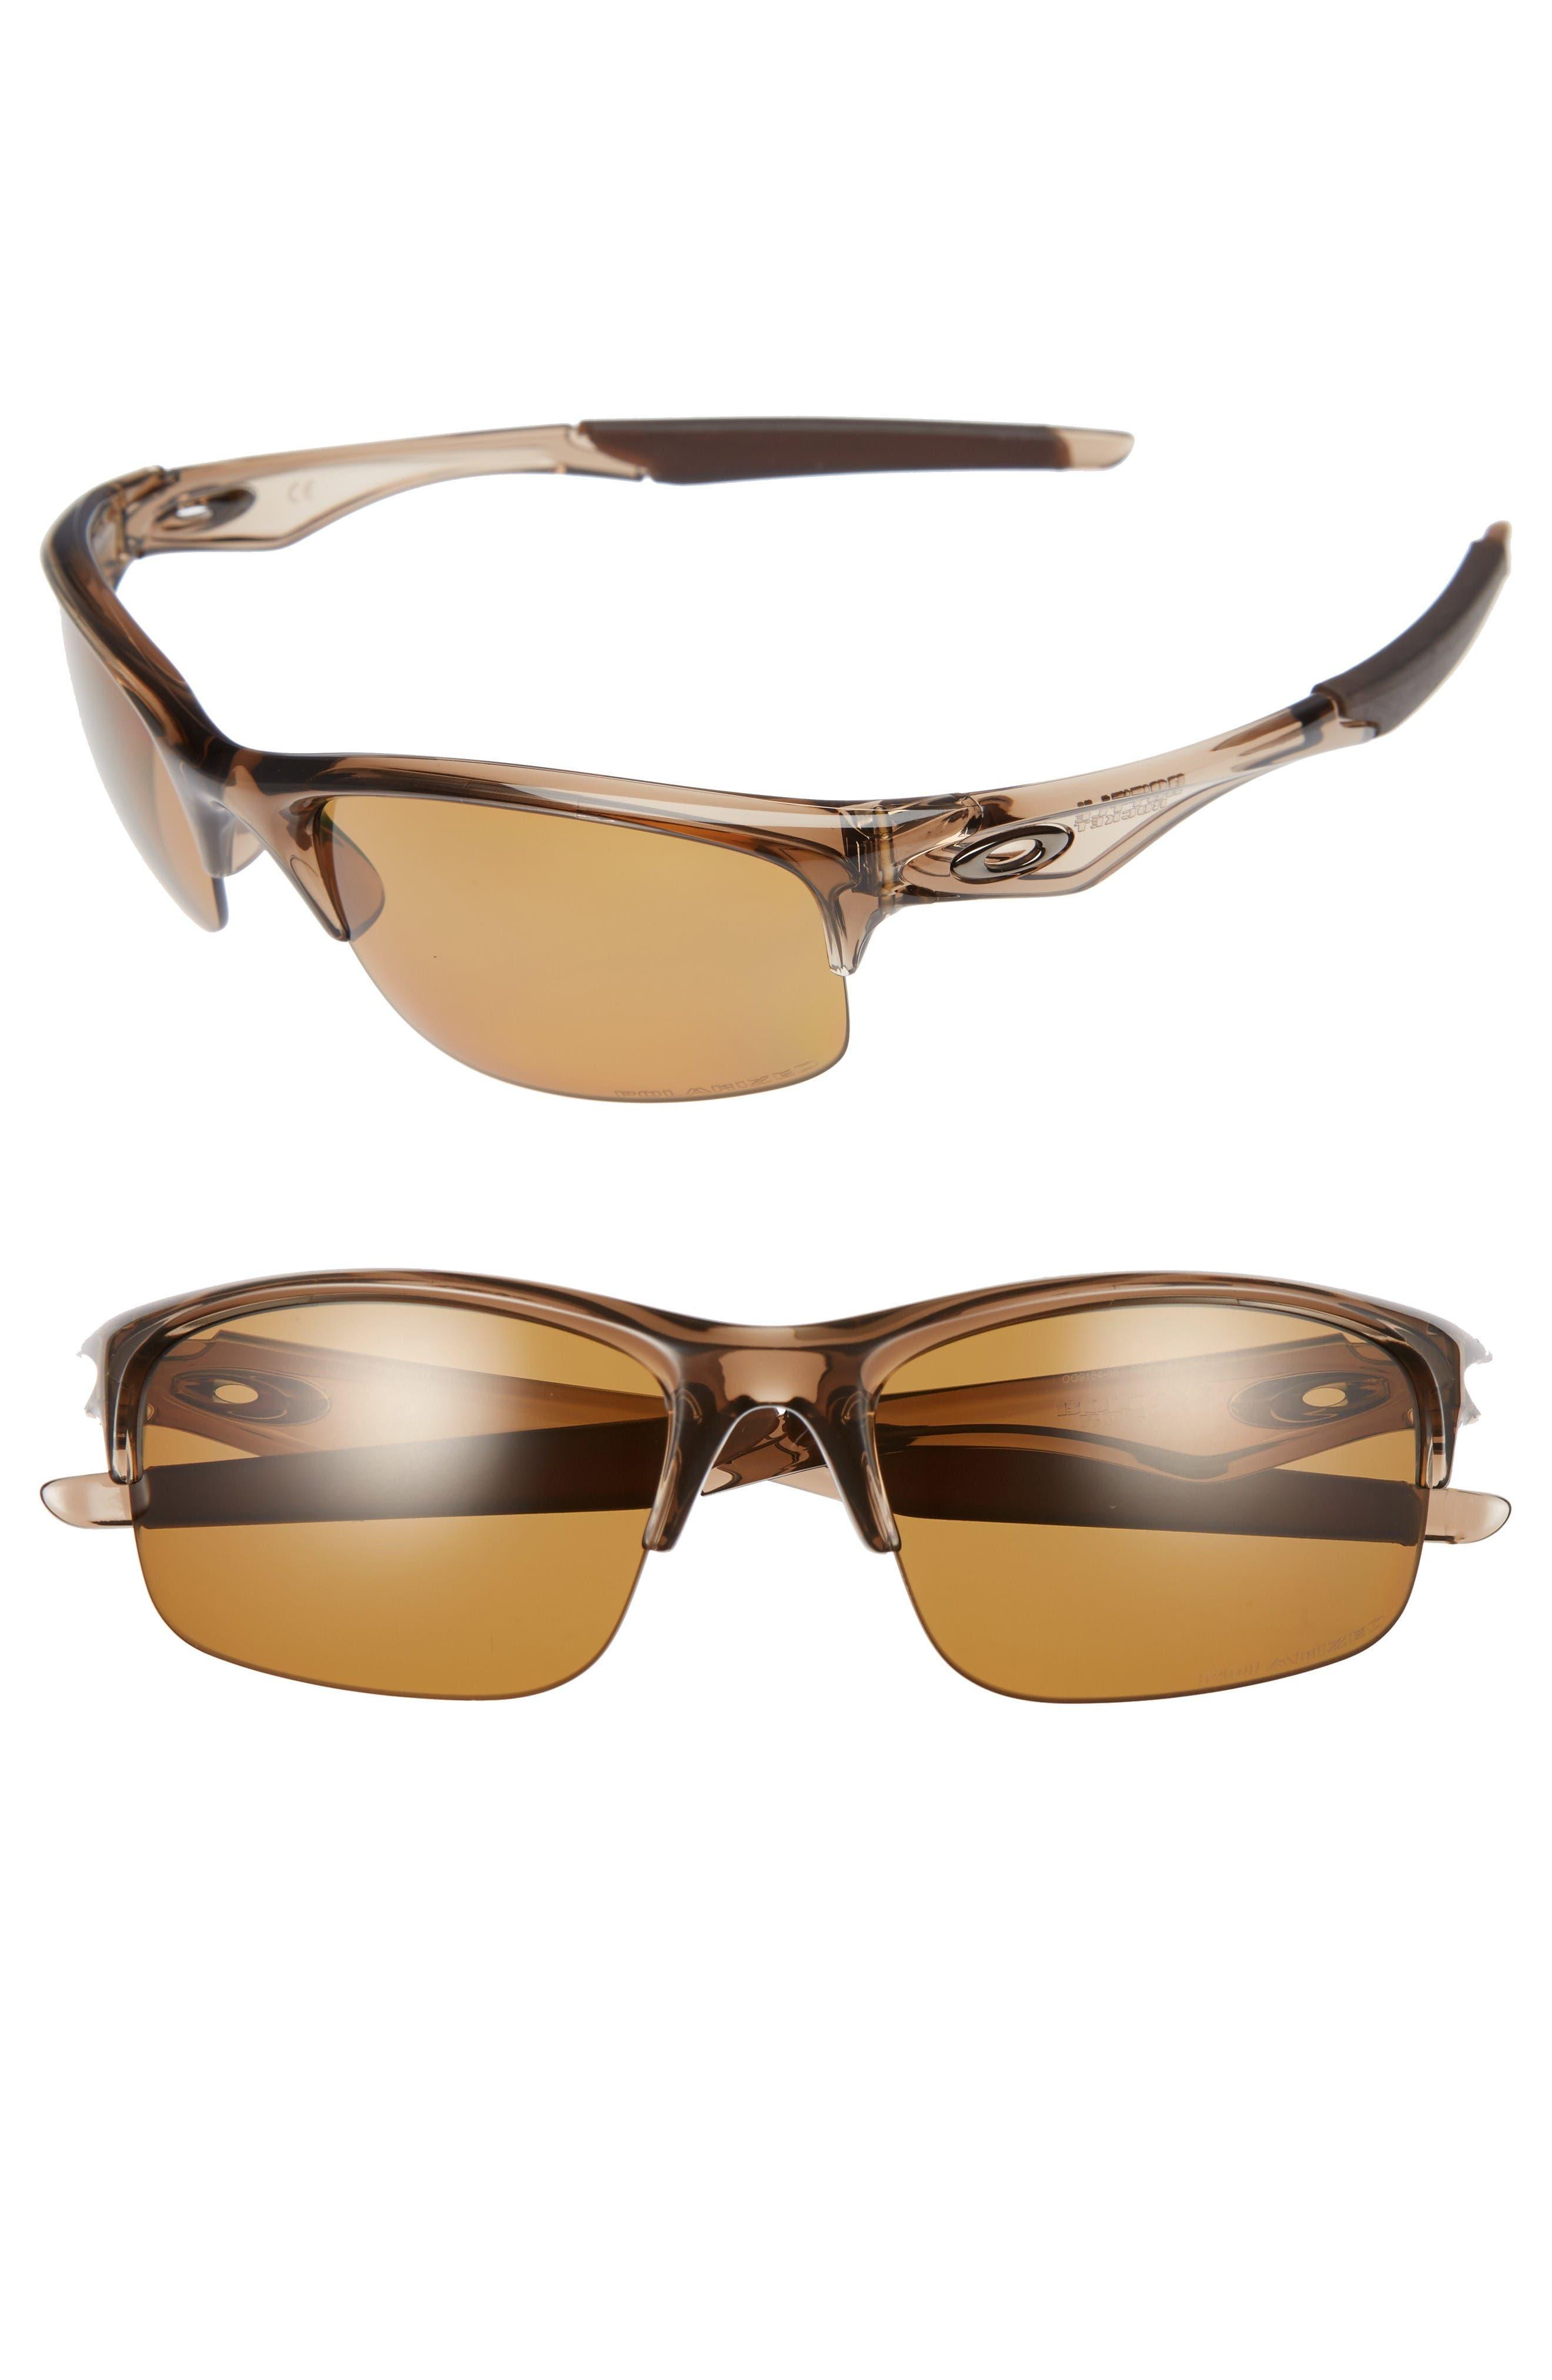 Main Image - Oakley Bottle Rocket 62mm Polarized Sunglasses